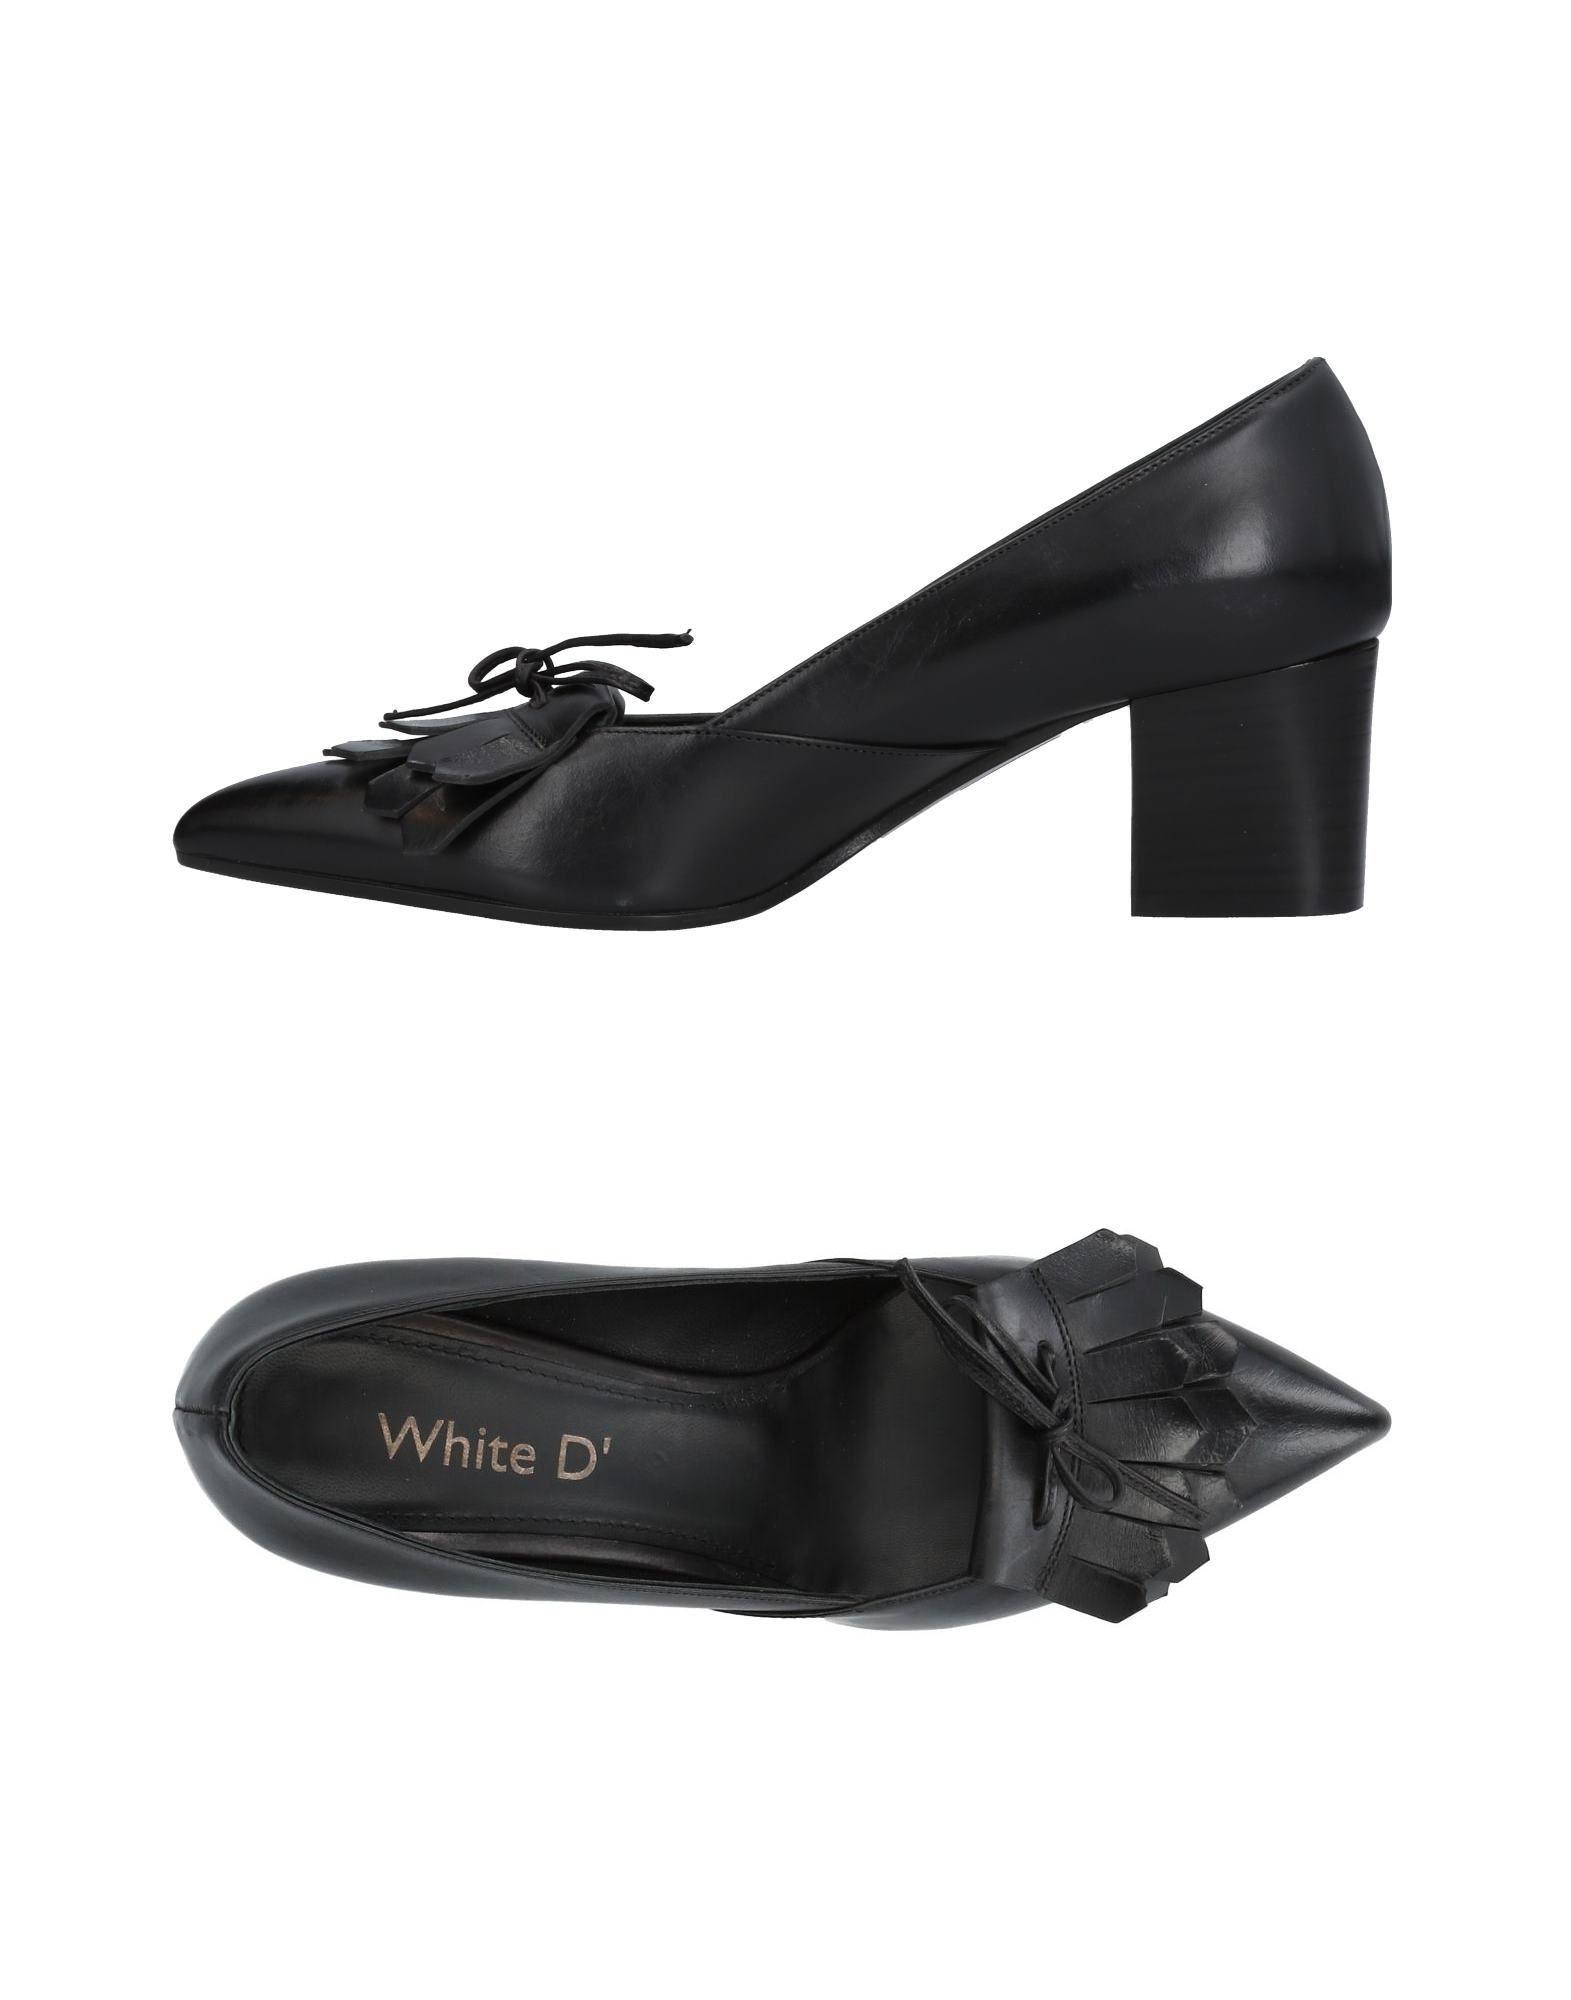 White D' Pumps Qualität Damen  11459983RE Gute Qualität Pumps beliebte Schuhe b98fc2